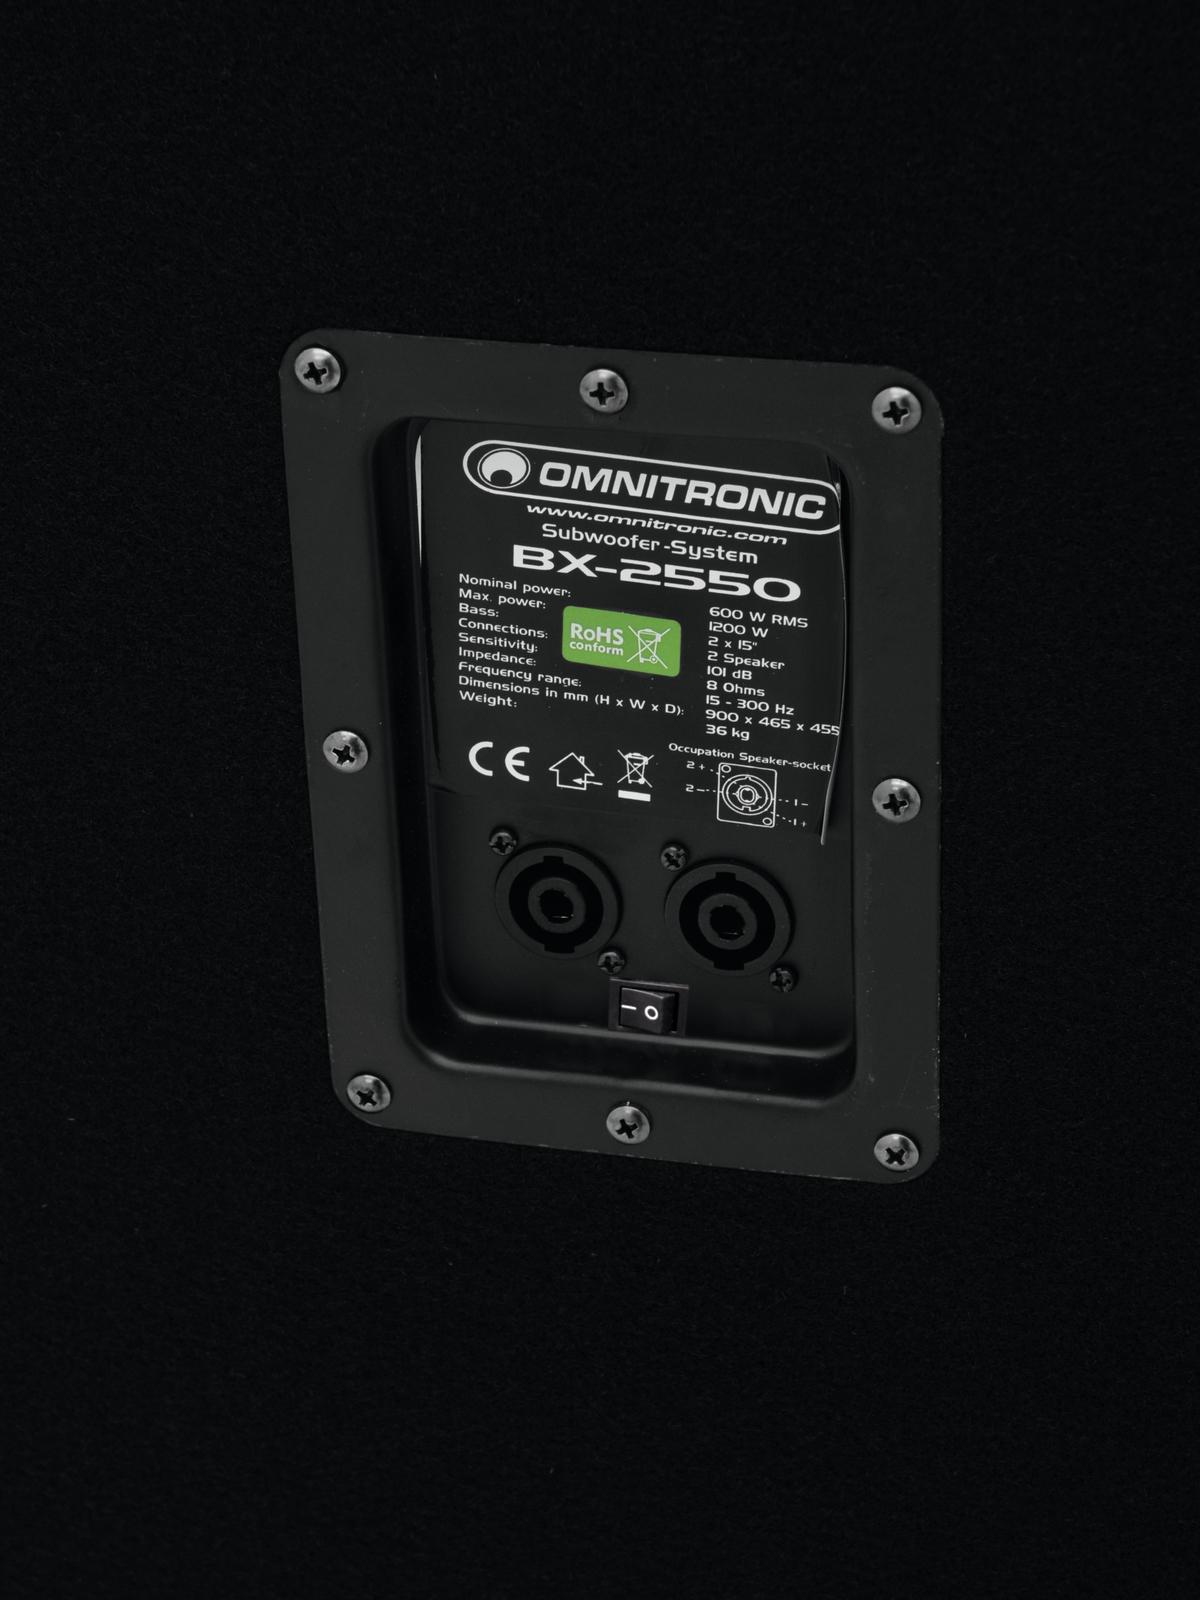 OMNITRONIC BX-2550 Subwoofer 1200W